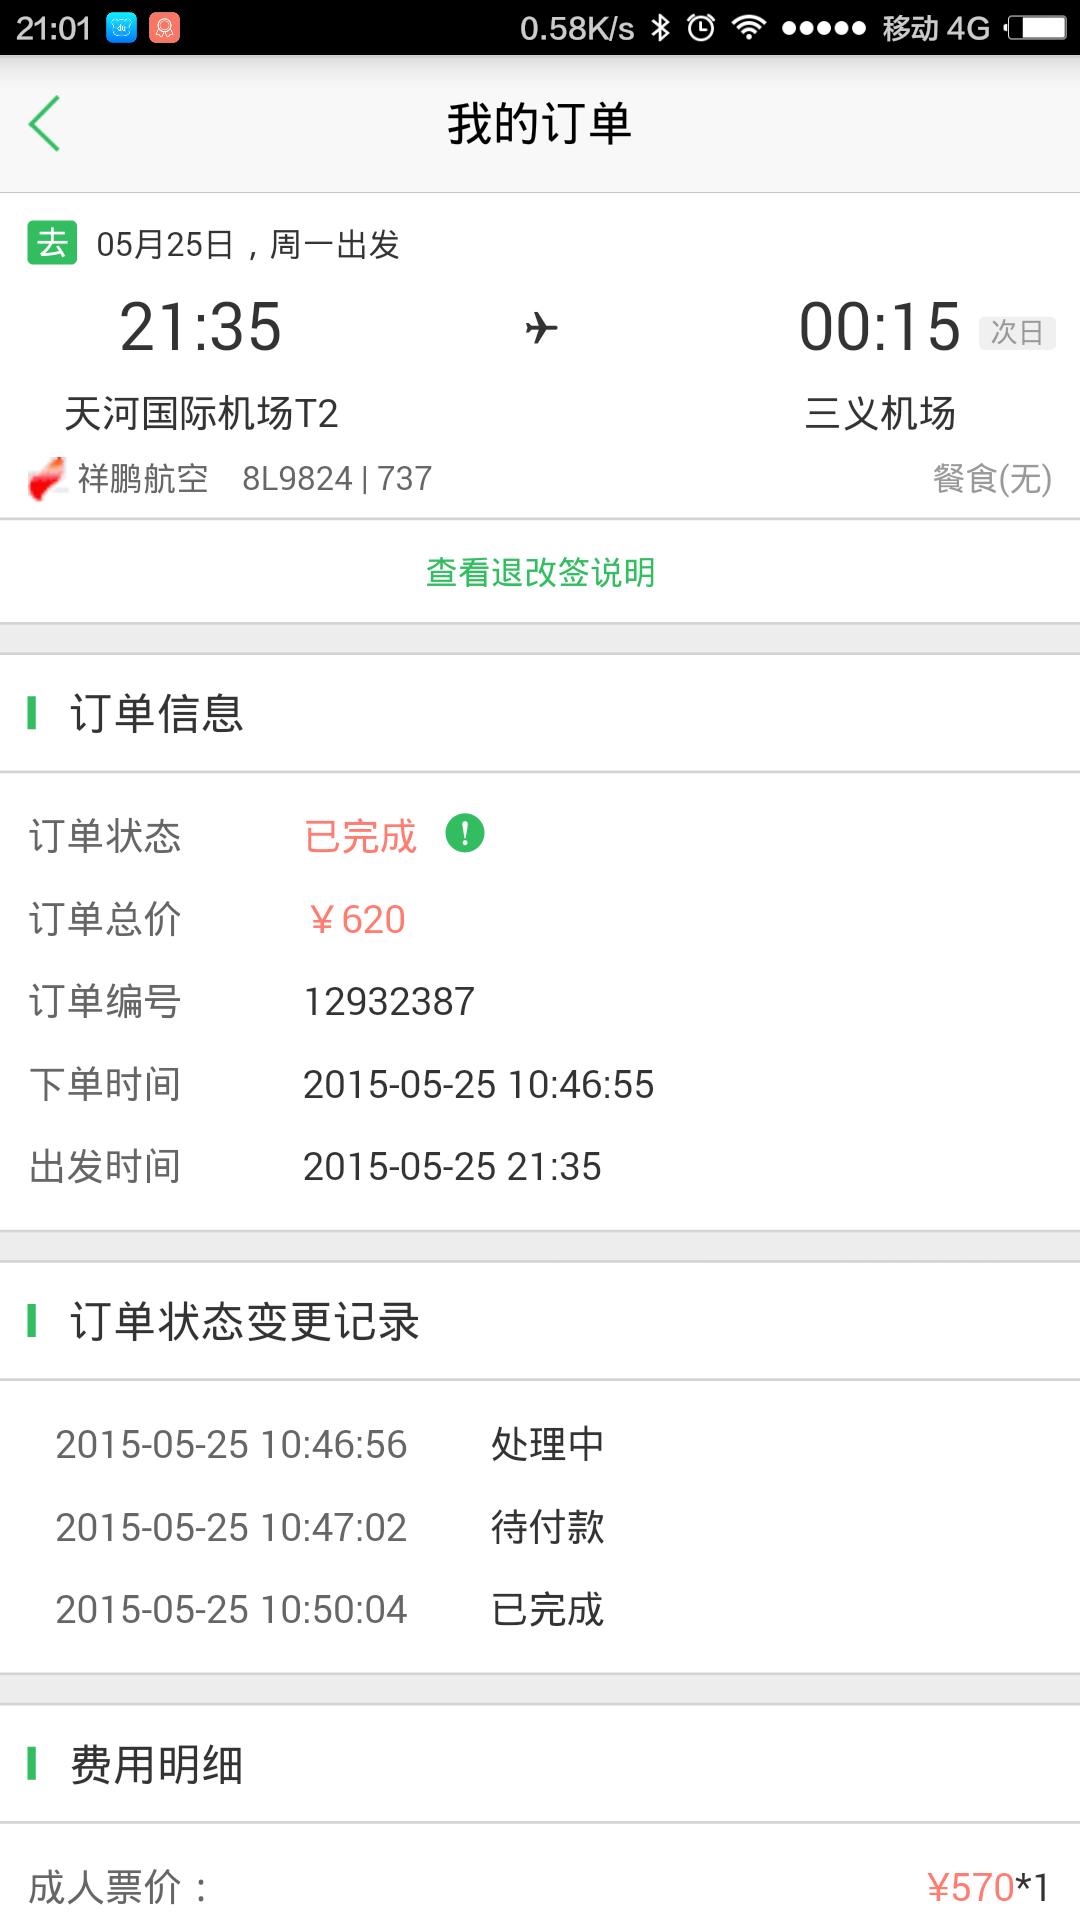 Screenshot_2015-11-09-21-01-12_com.tuniu.app.ui.png